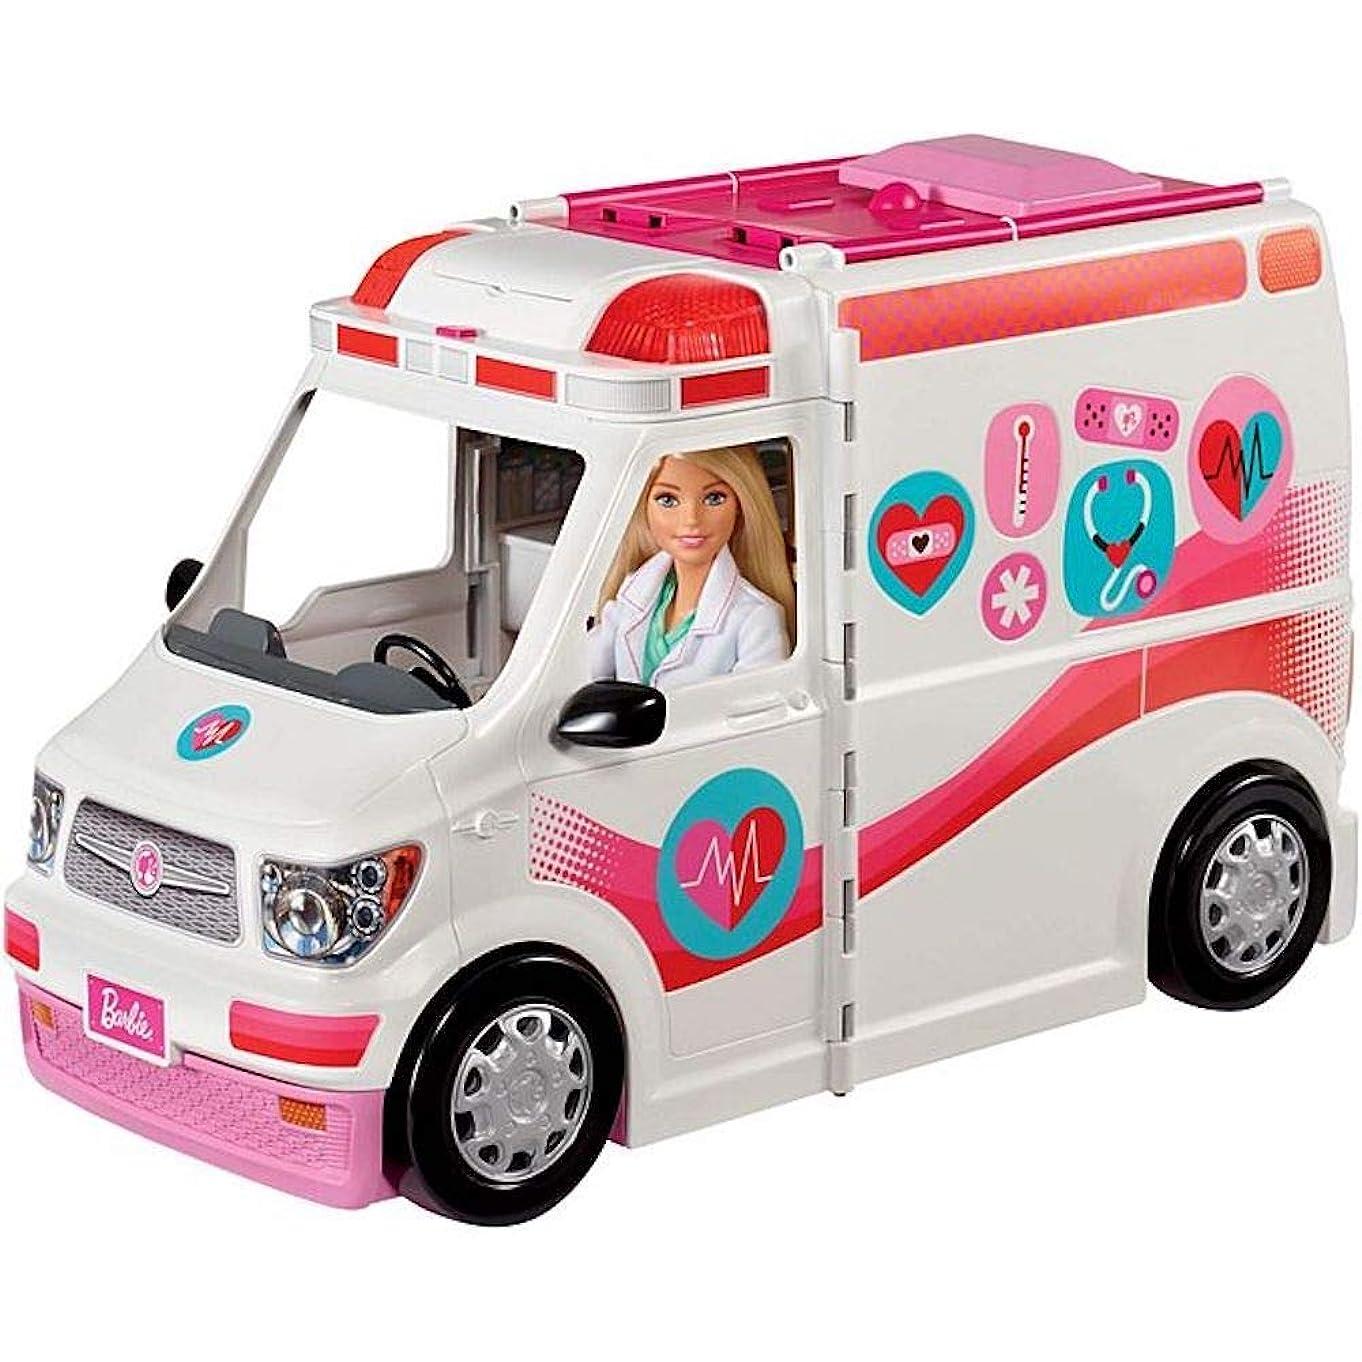 Barbie Care Clinic Vehicle